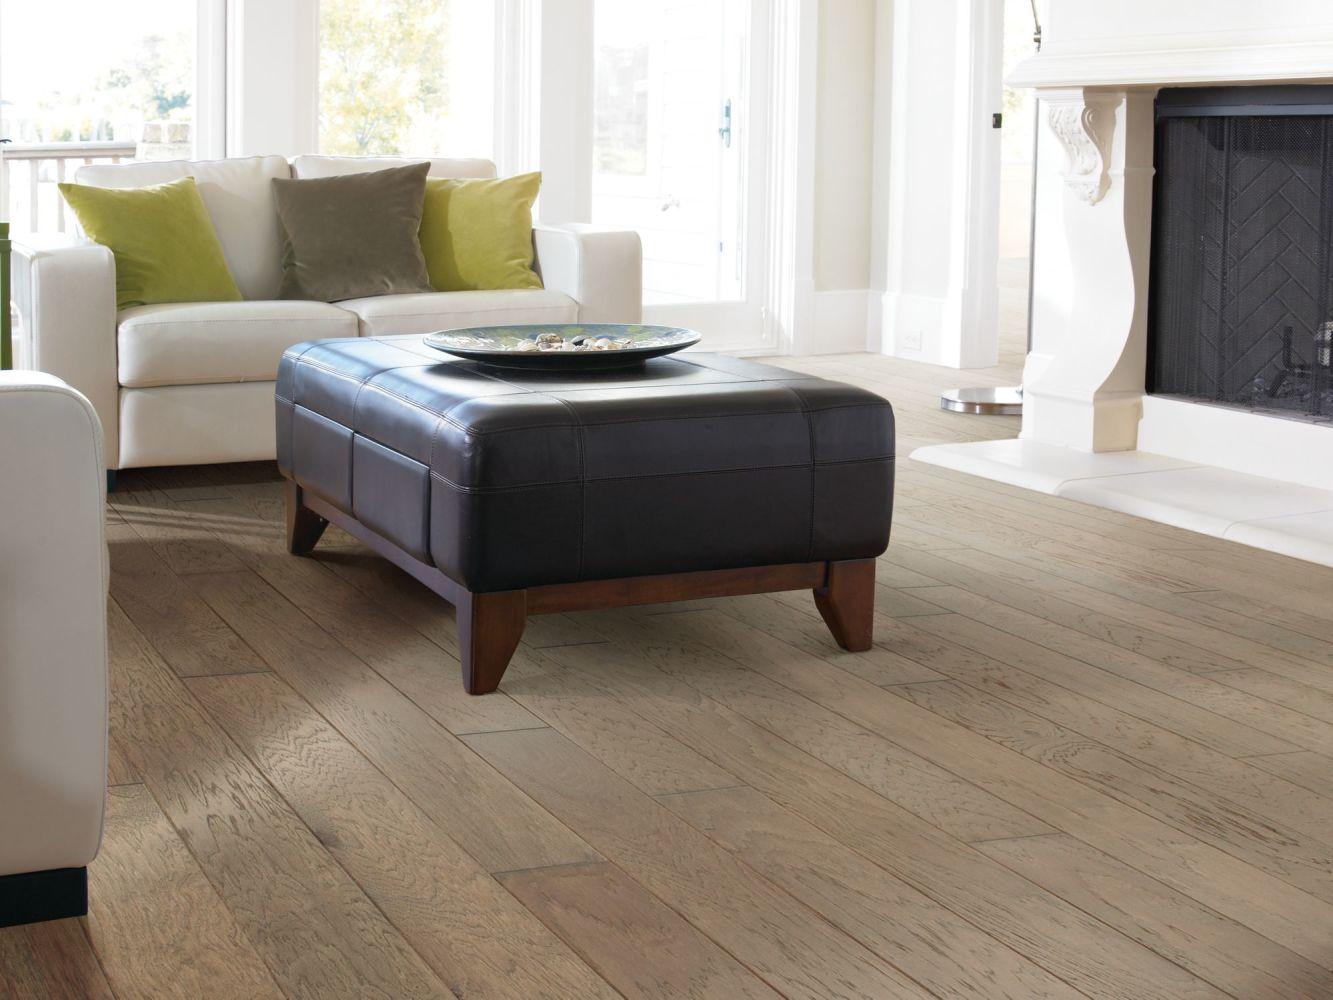 Shaw Floors Home Fn Gold Hardwood Kings Canyon 2 – 6 3/8 Cinnamon 02000_HW601